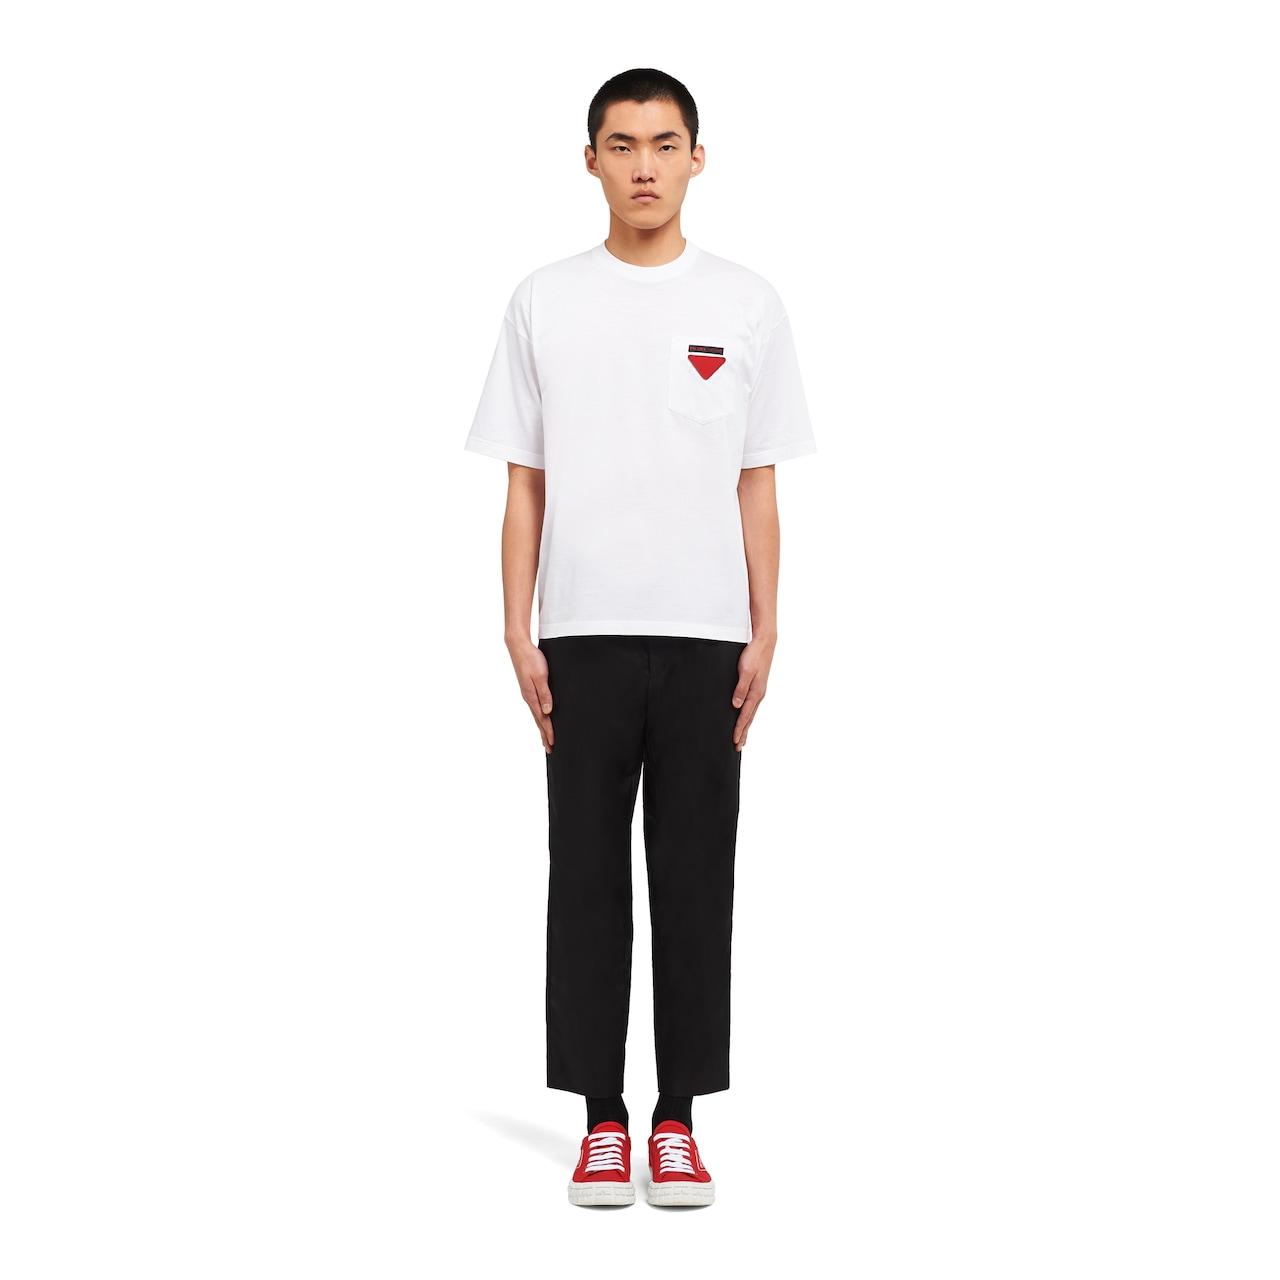 Prada Cotton jersey T-shirt - 3-Pack 2